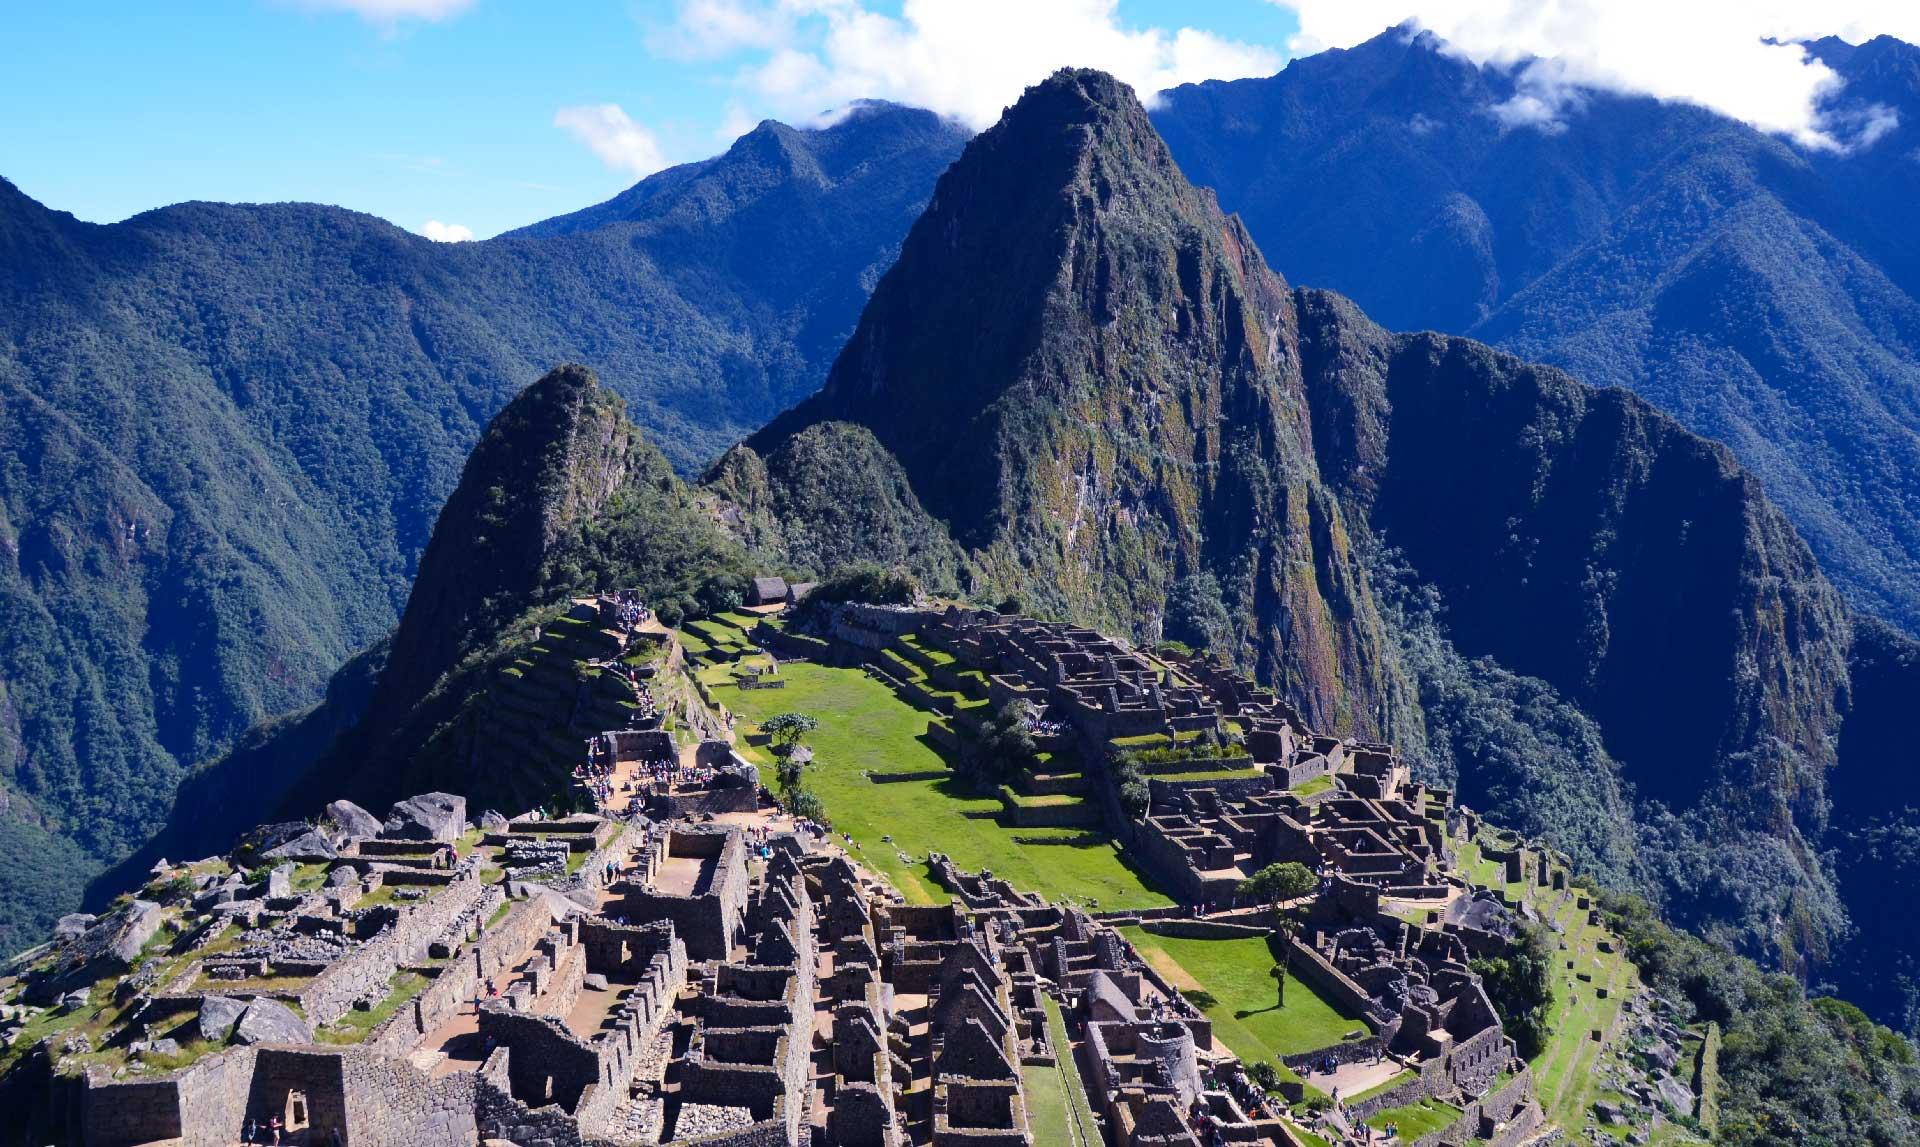 Perou-Machu-Picchu-c-G.MONTCHARMONT-2-4-web